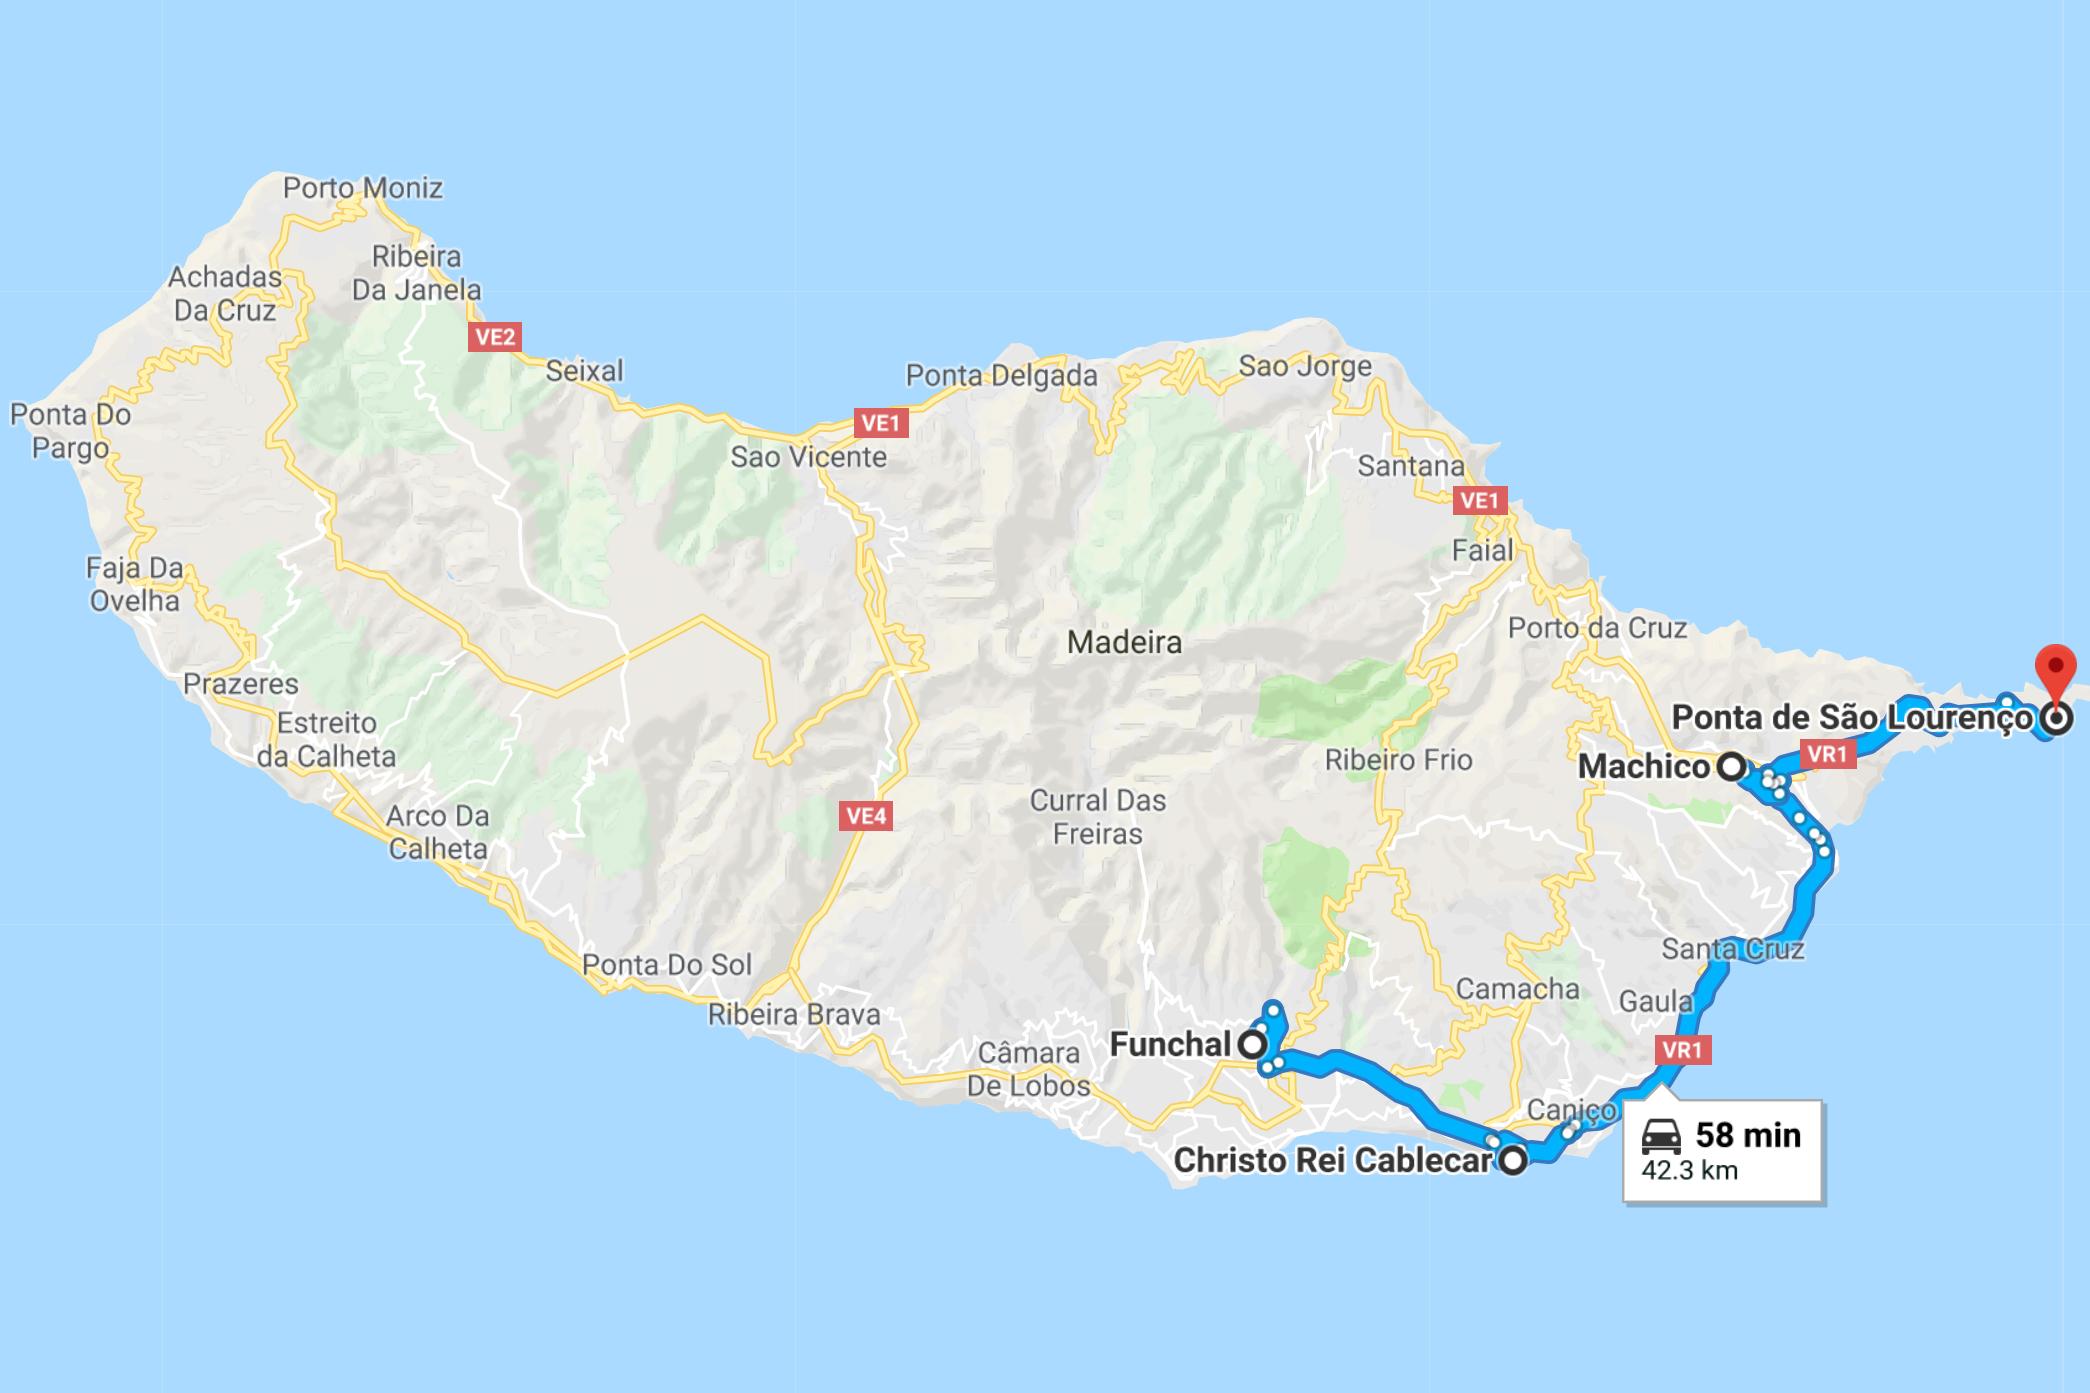 map-of-madeira-island-google-maps